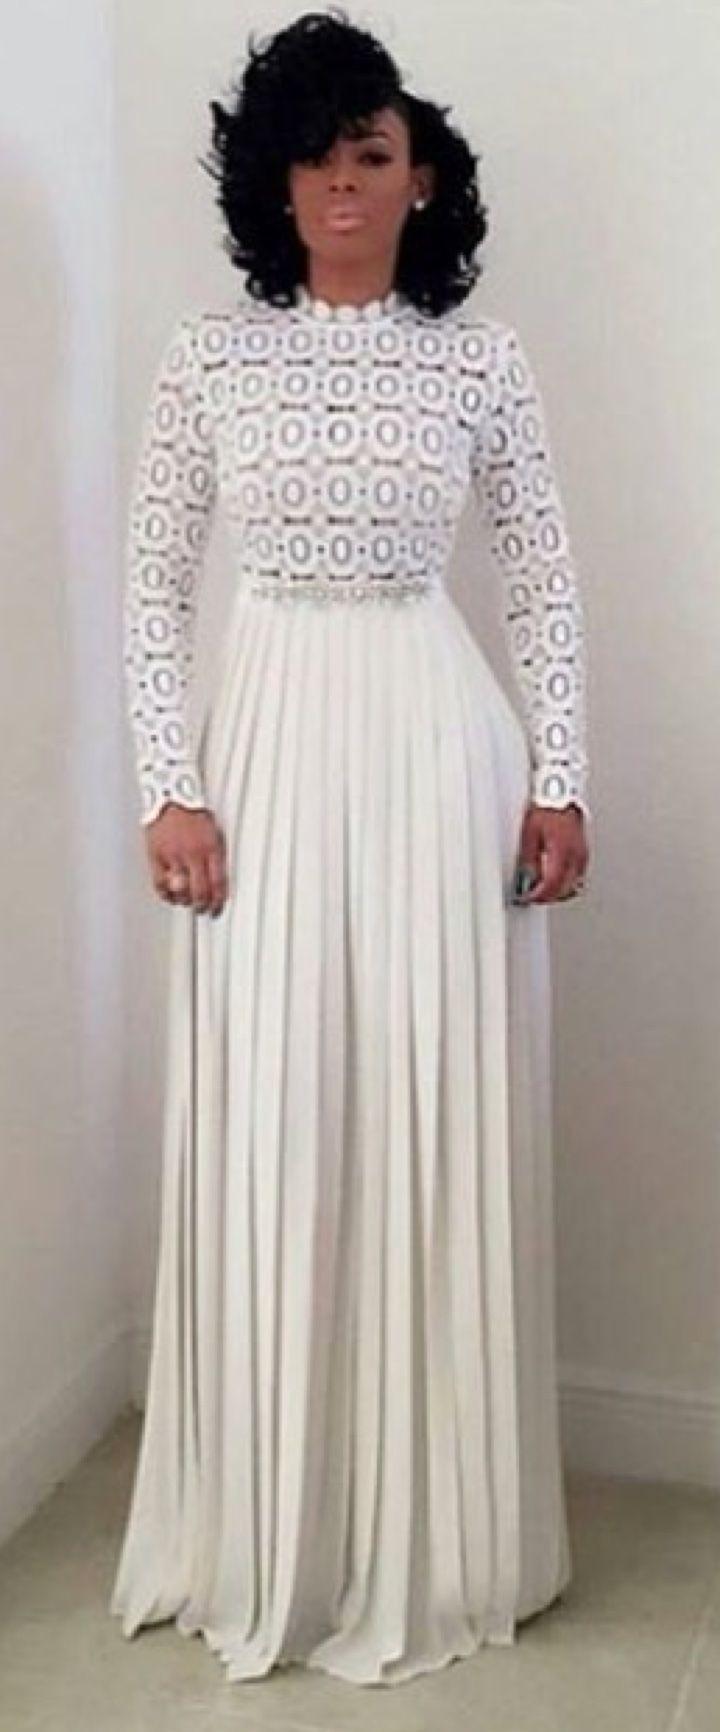 White Dresses for Boat Ride – Fashion dresses